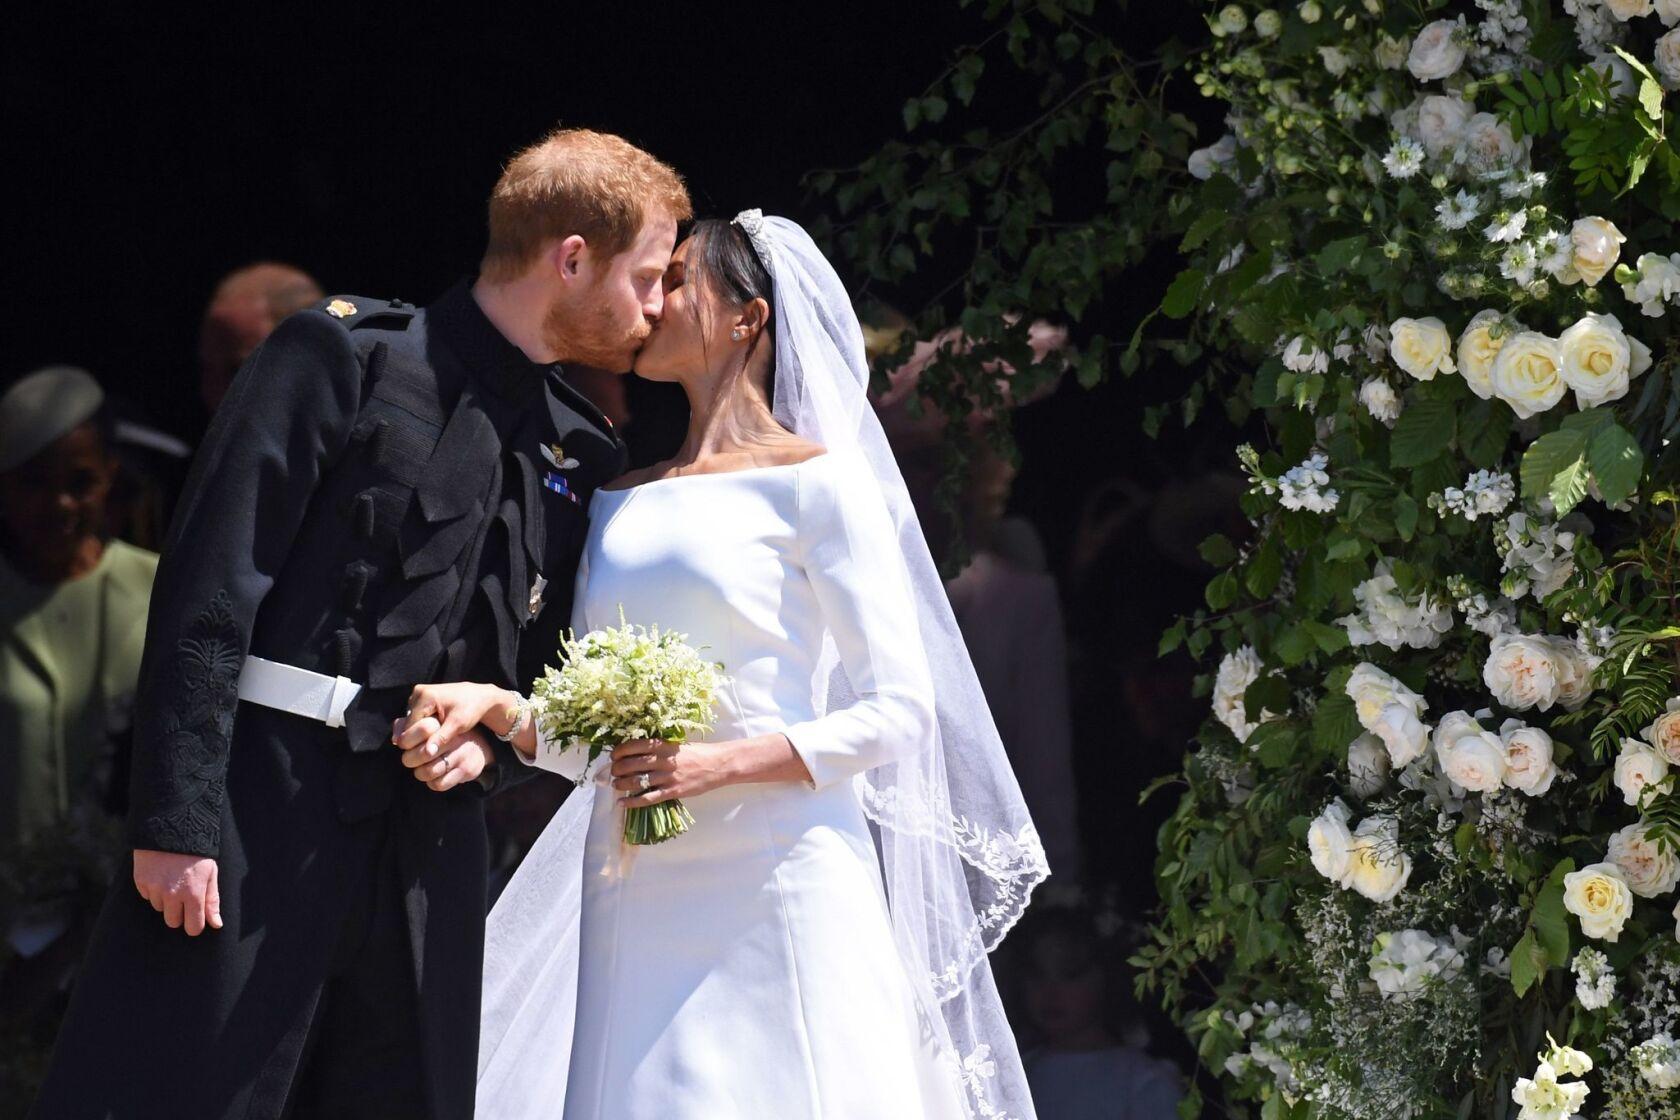 Meghan Markle Marries Prince Harry Wearing A Wedding Dress